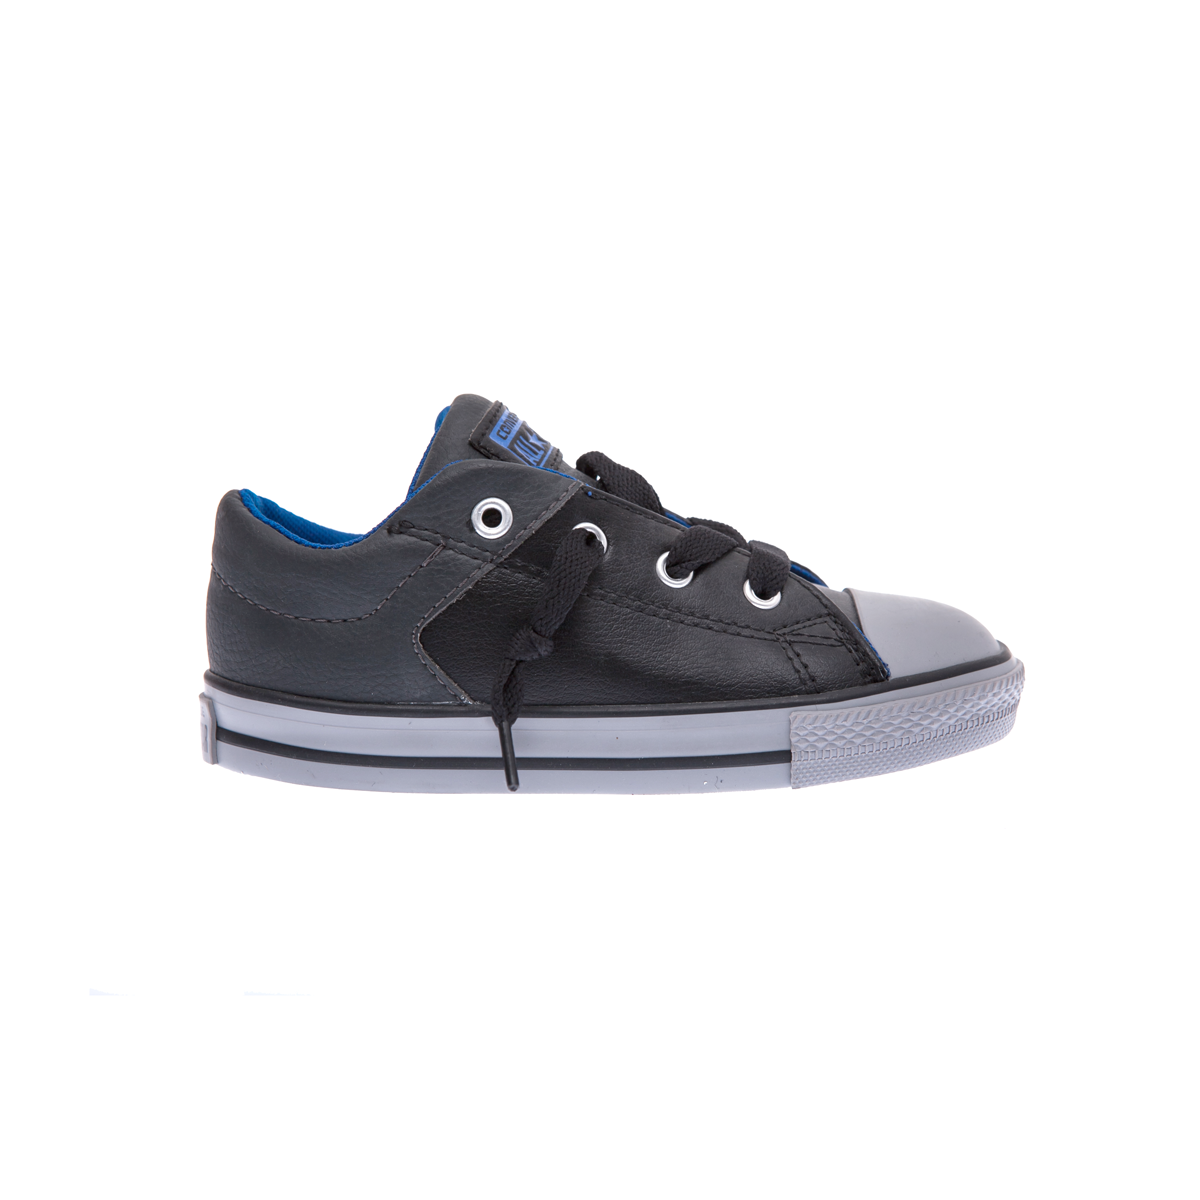 CONVERSE – Βρεφικά παπούτσια Chuck Taylor All Star High Str γκρι